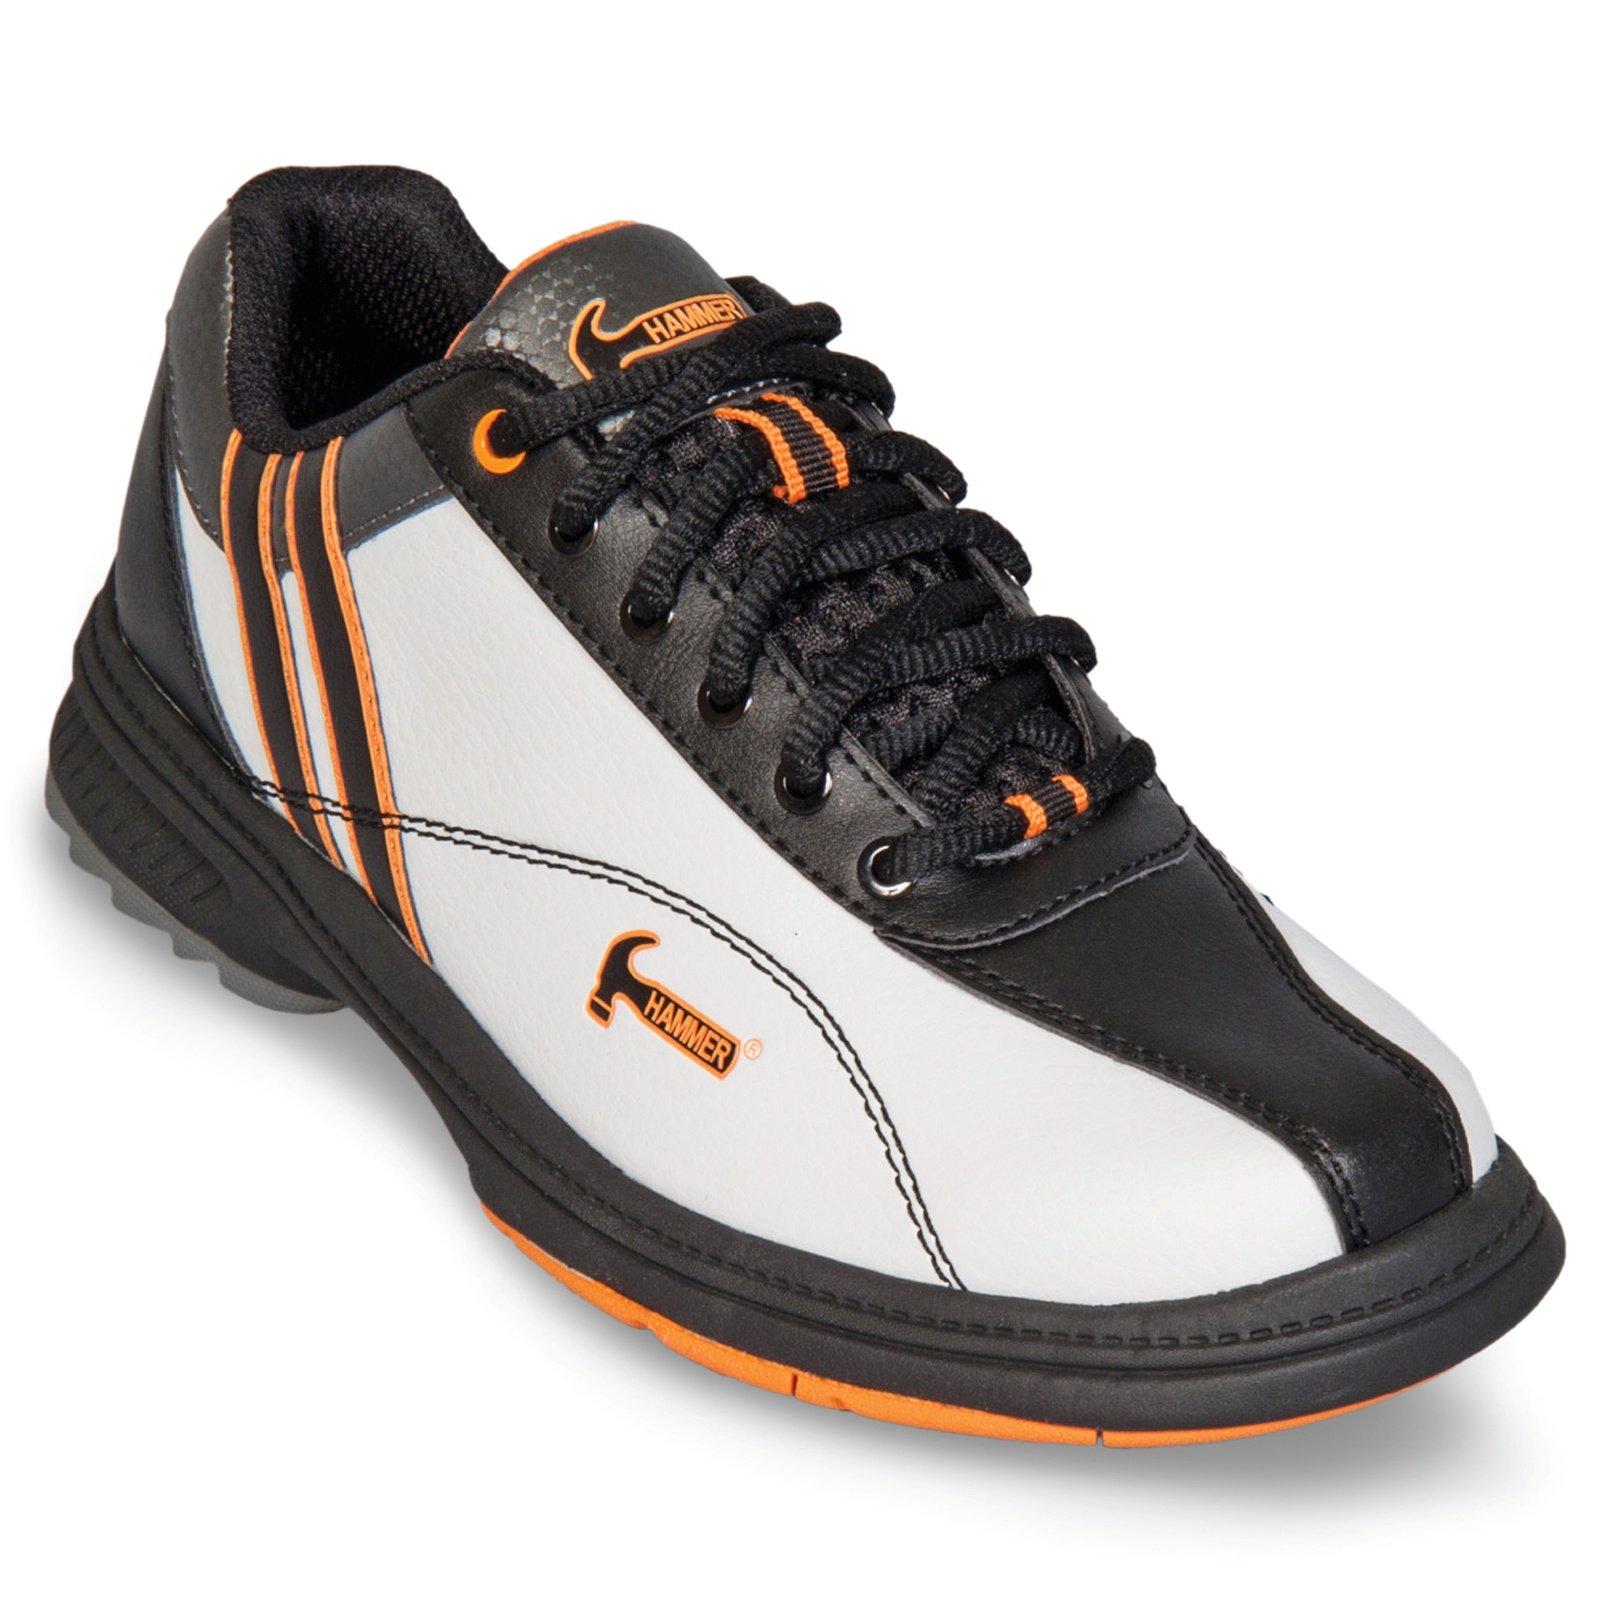 KR Strikeforce Women's Hammer Vixen Wide Width Bowling Shoes, White/Black/Orange, Size 6.5